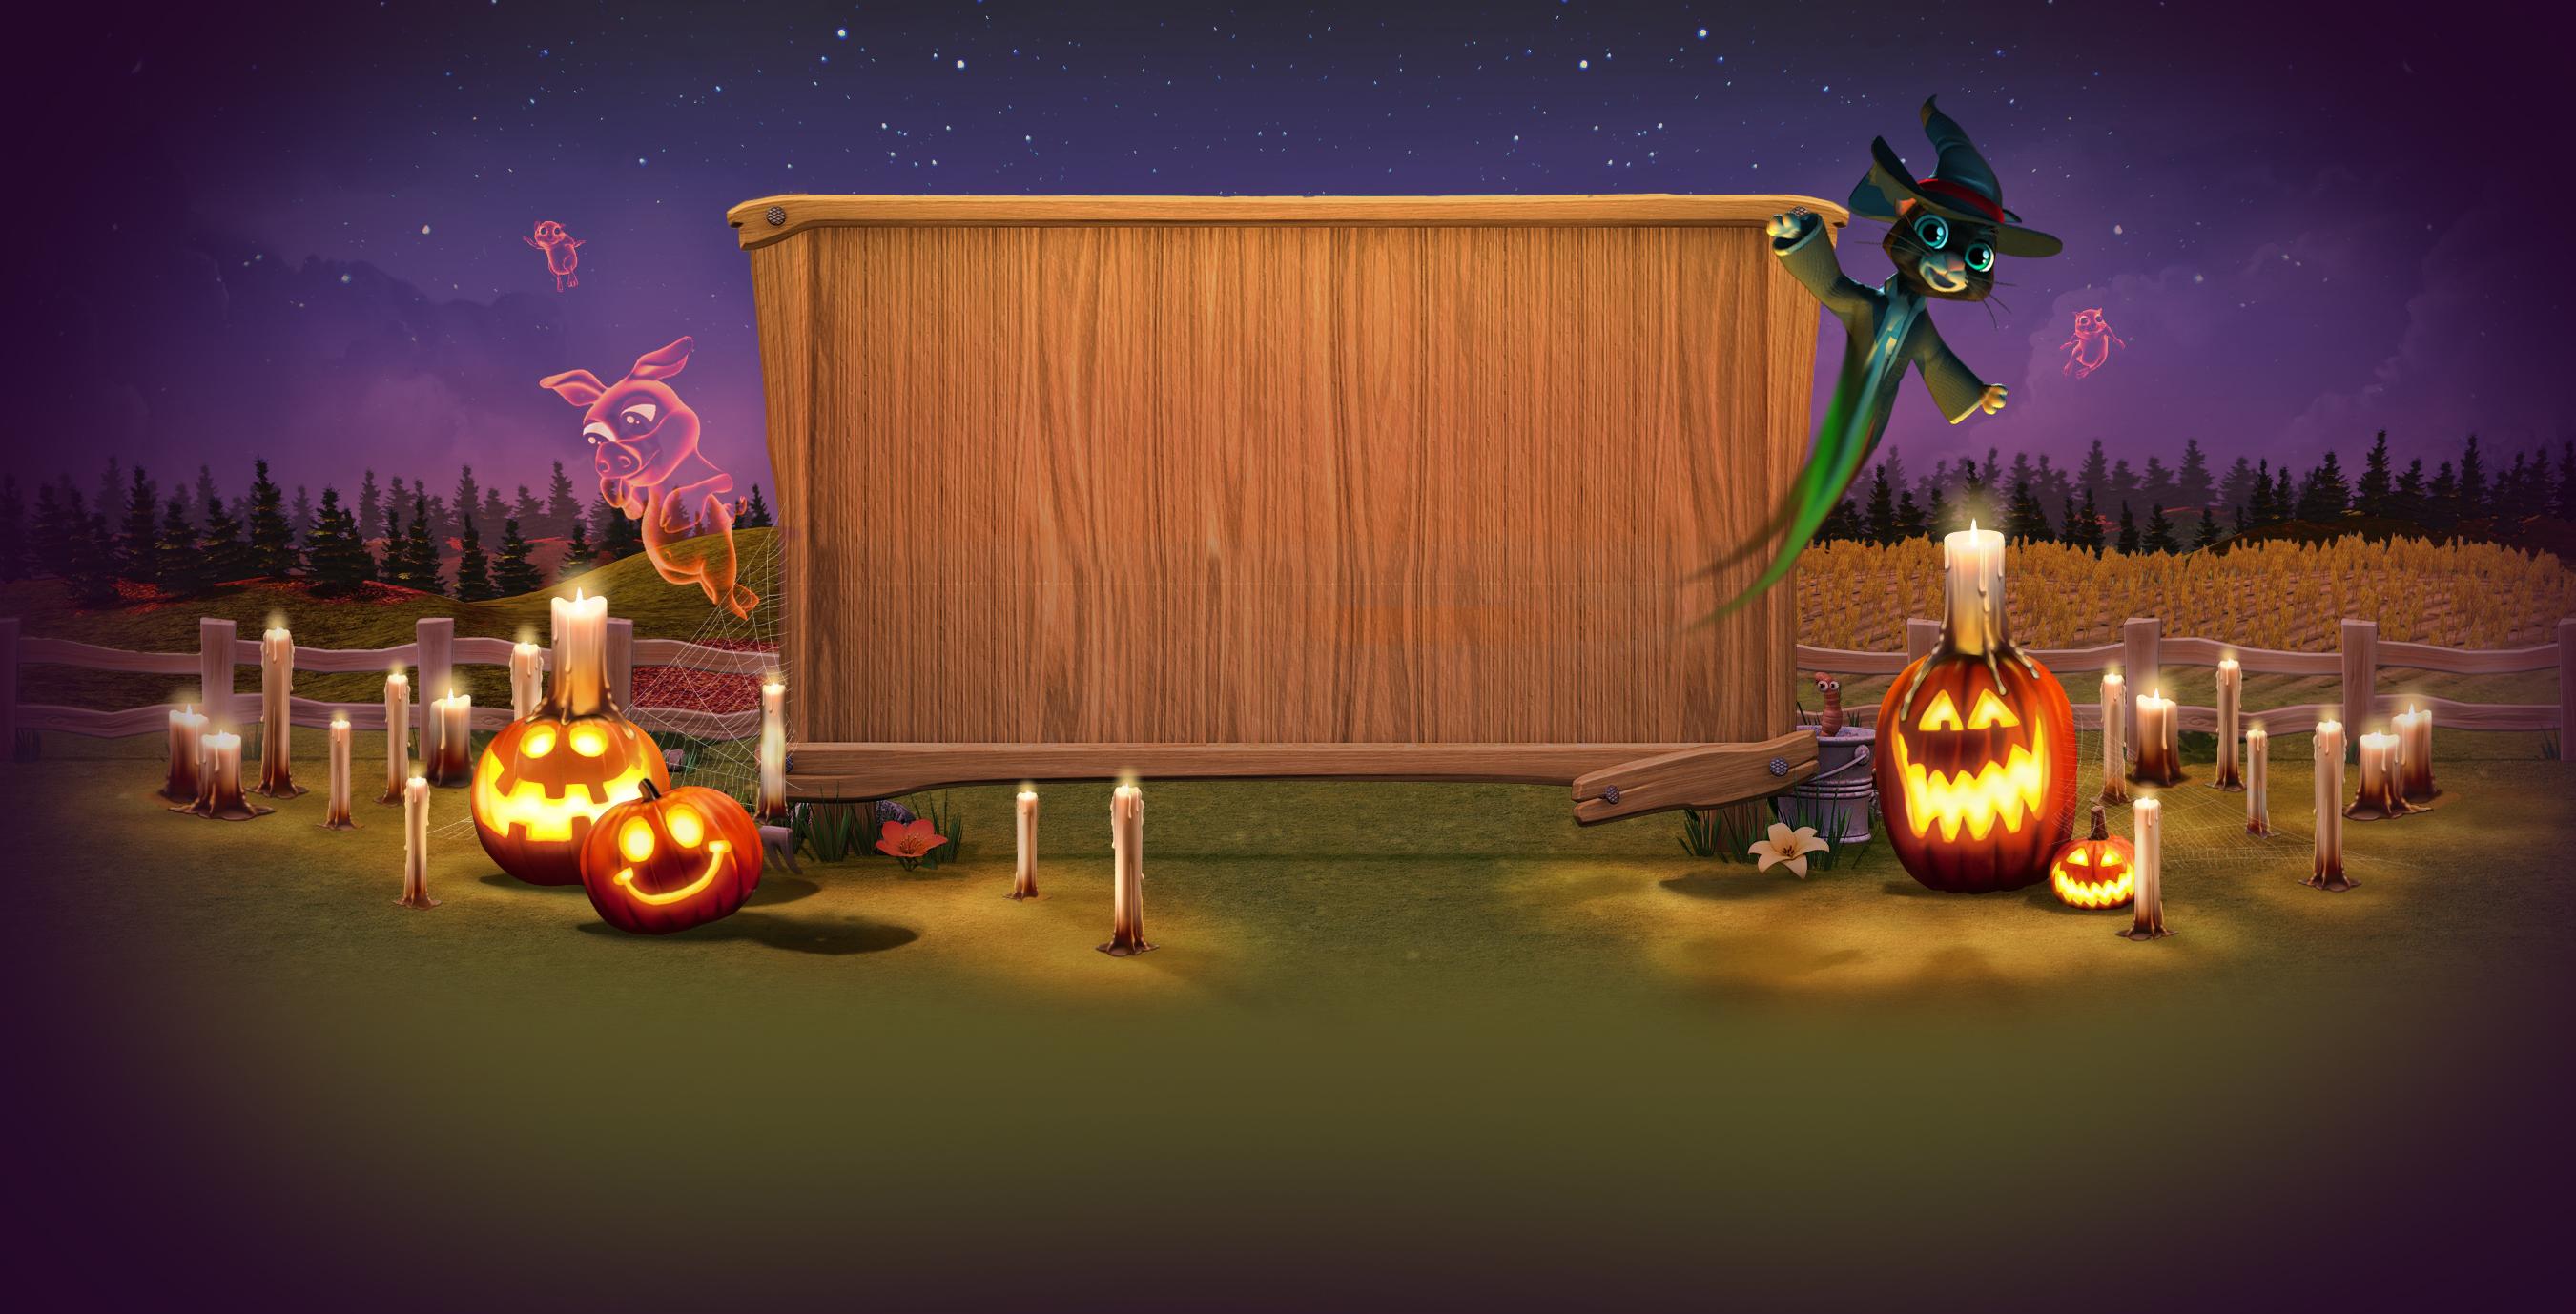 bg_halloween2.jpg